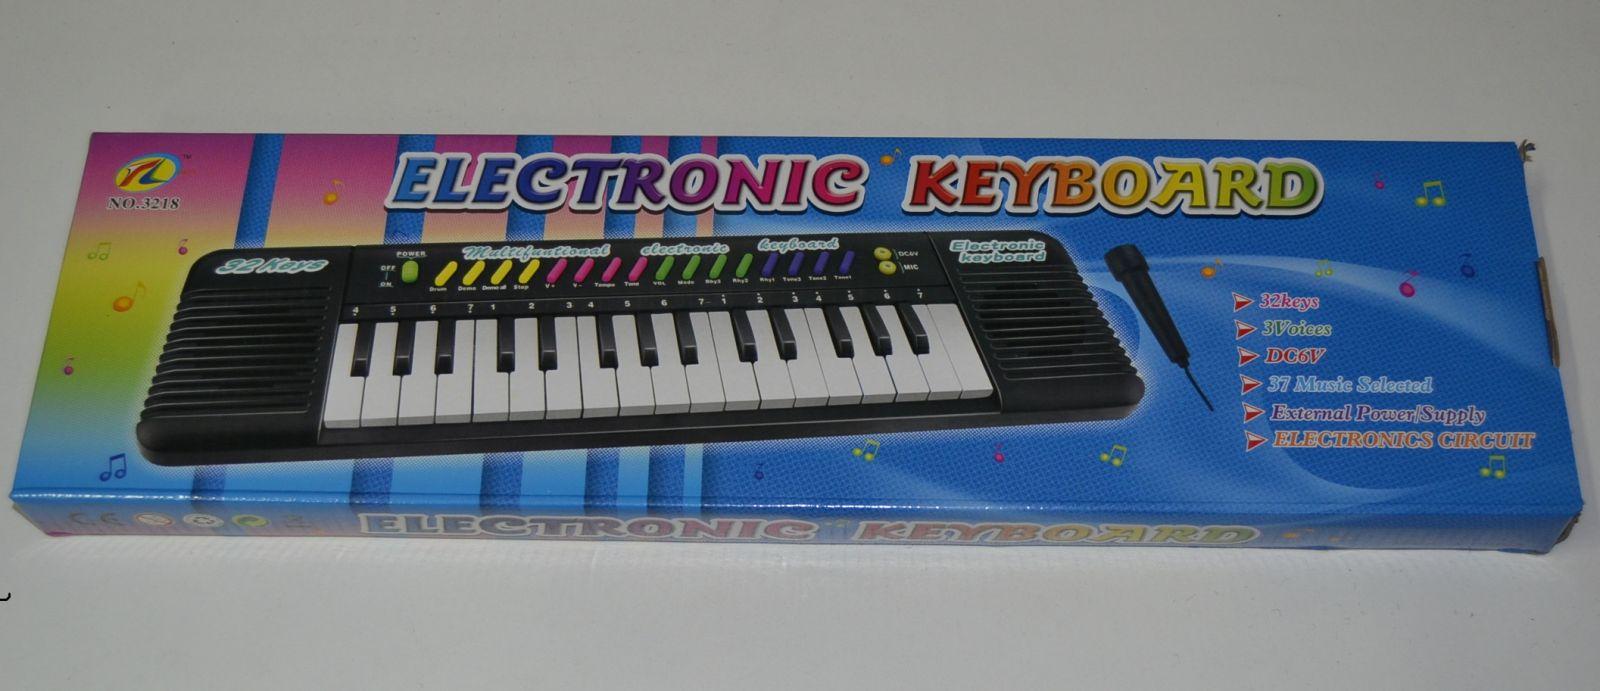 Dětské elektroncké klávesy na baterie - 3218, pianko